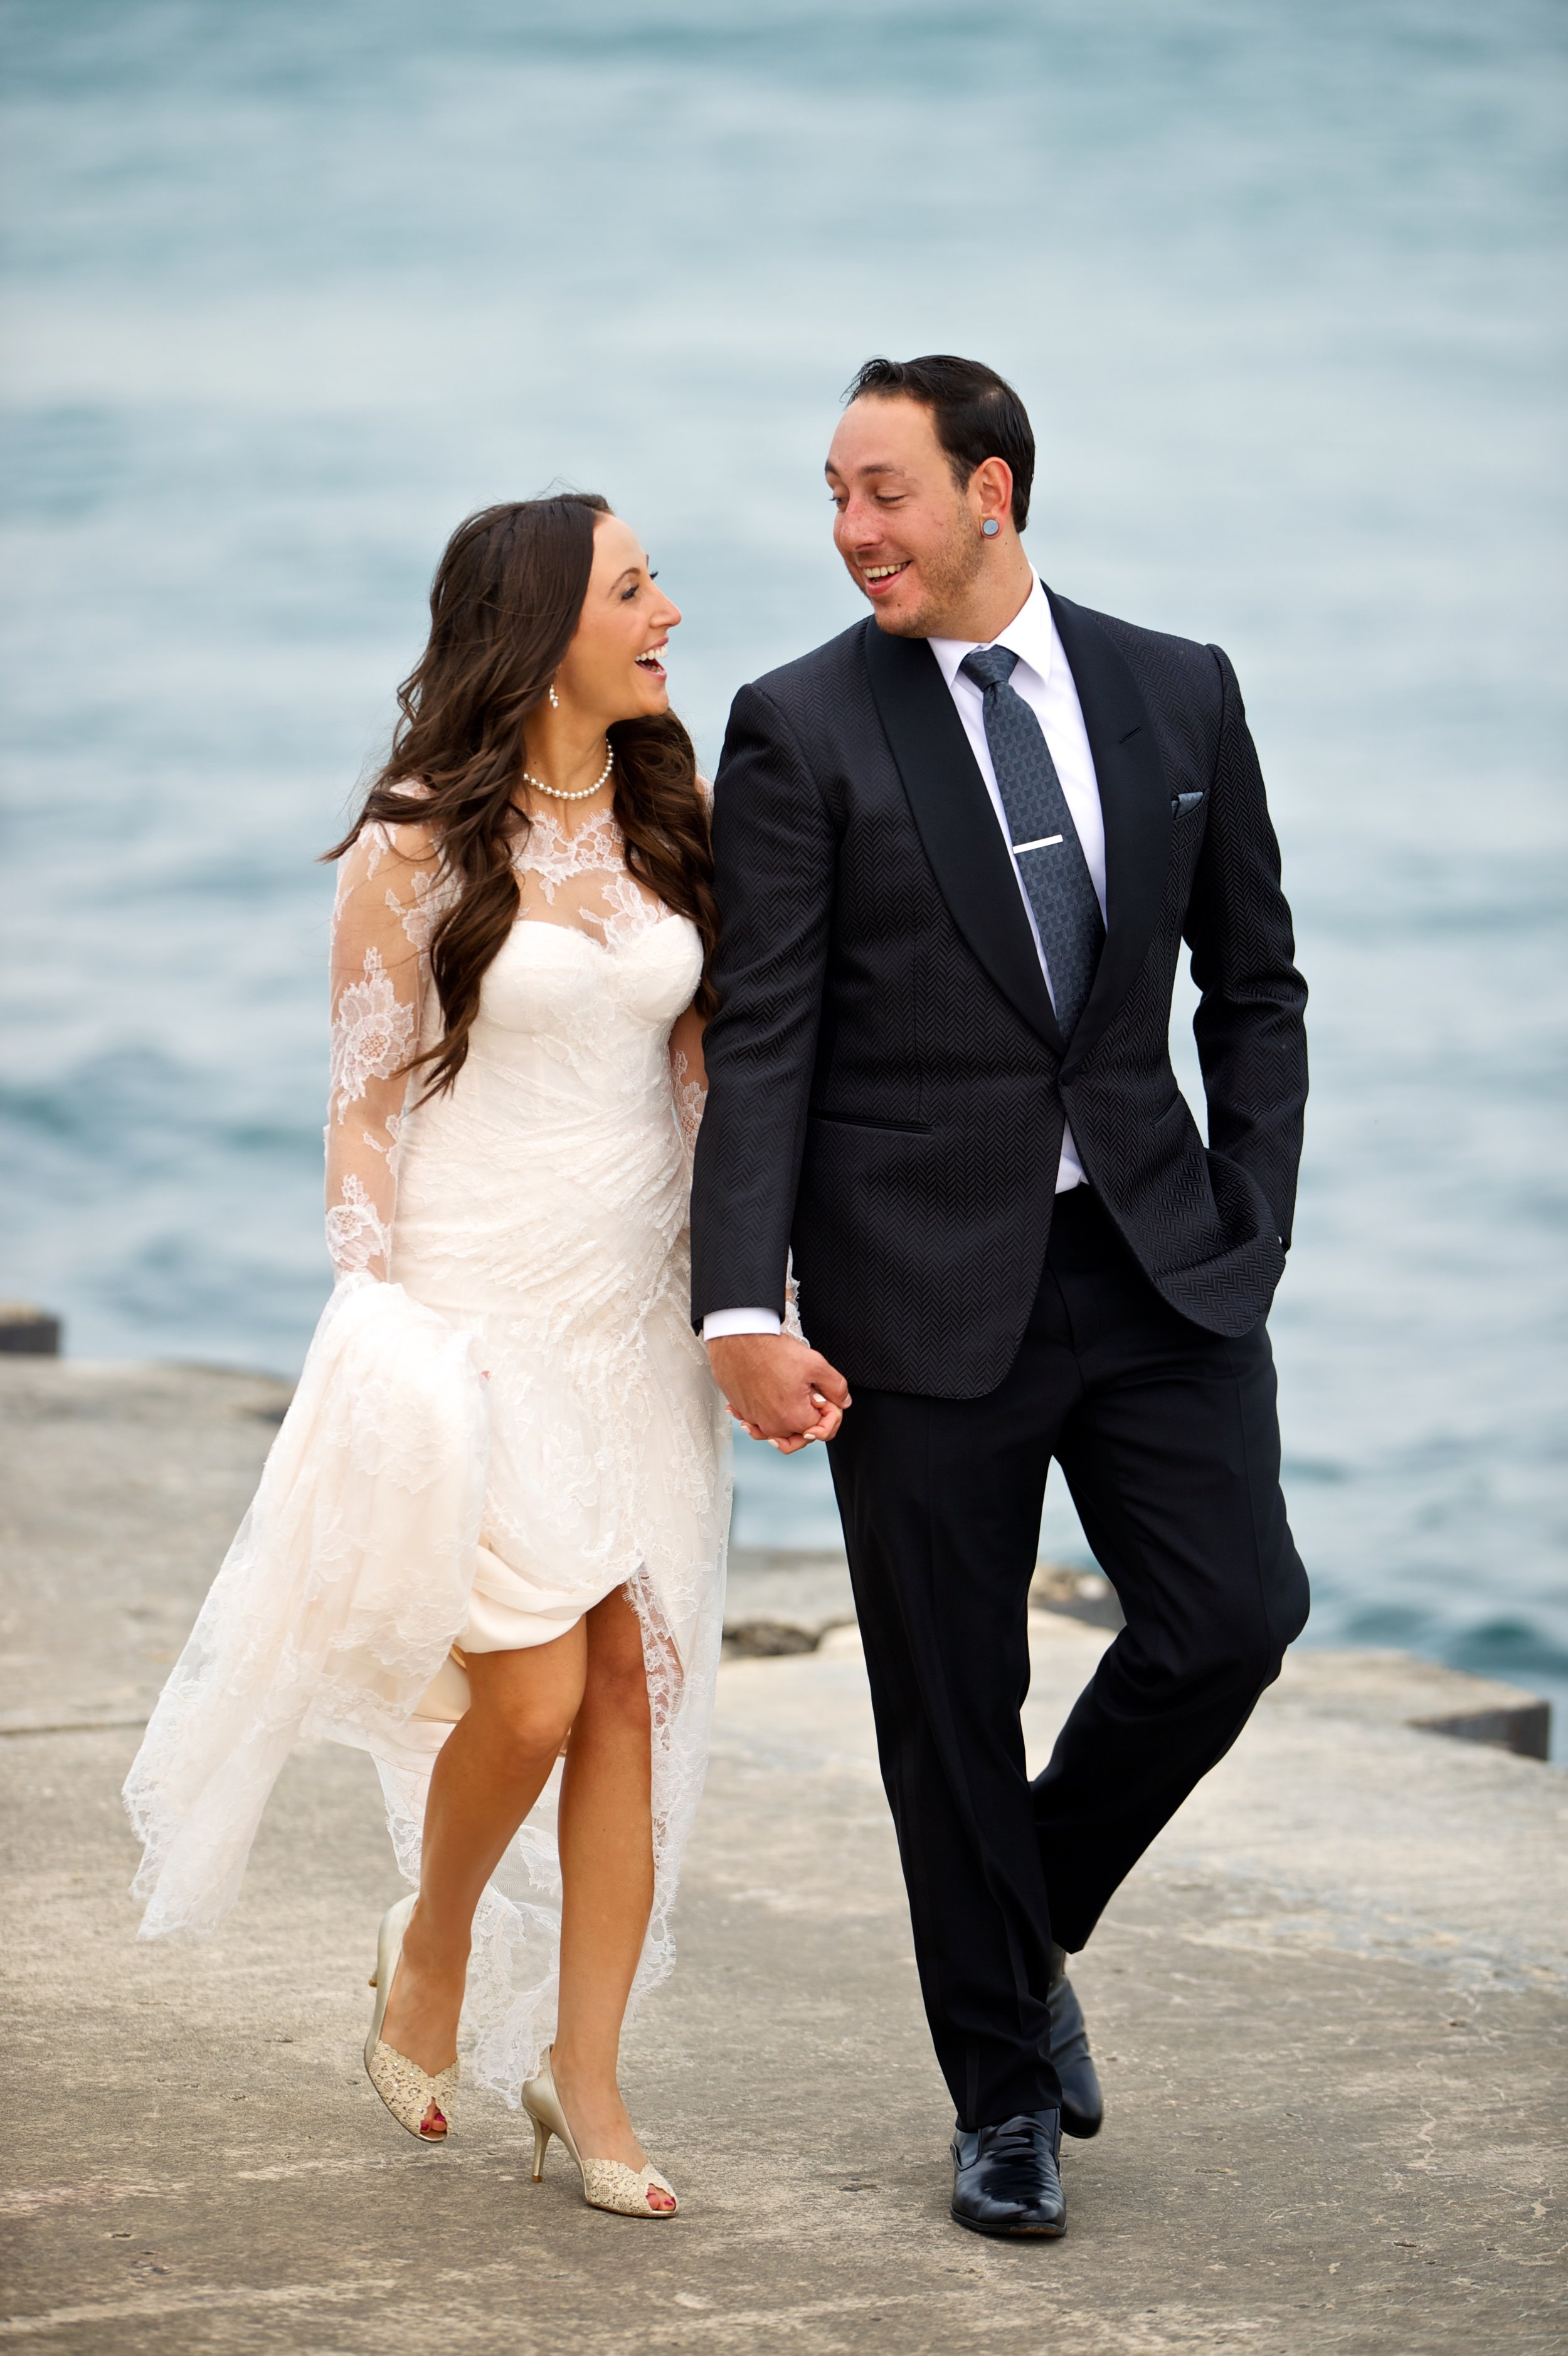 Chicago lakefront wedding photography